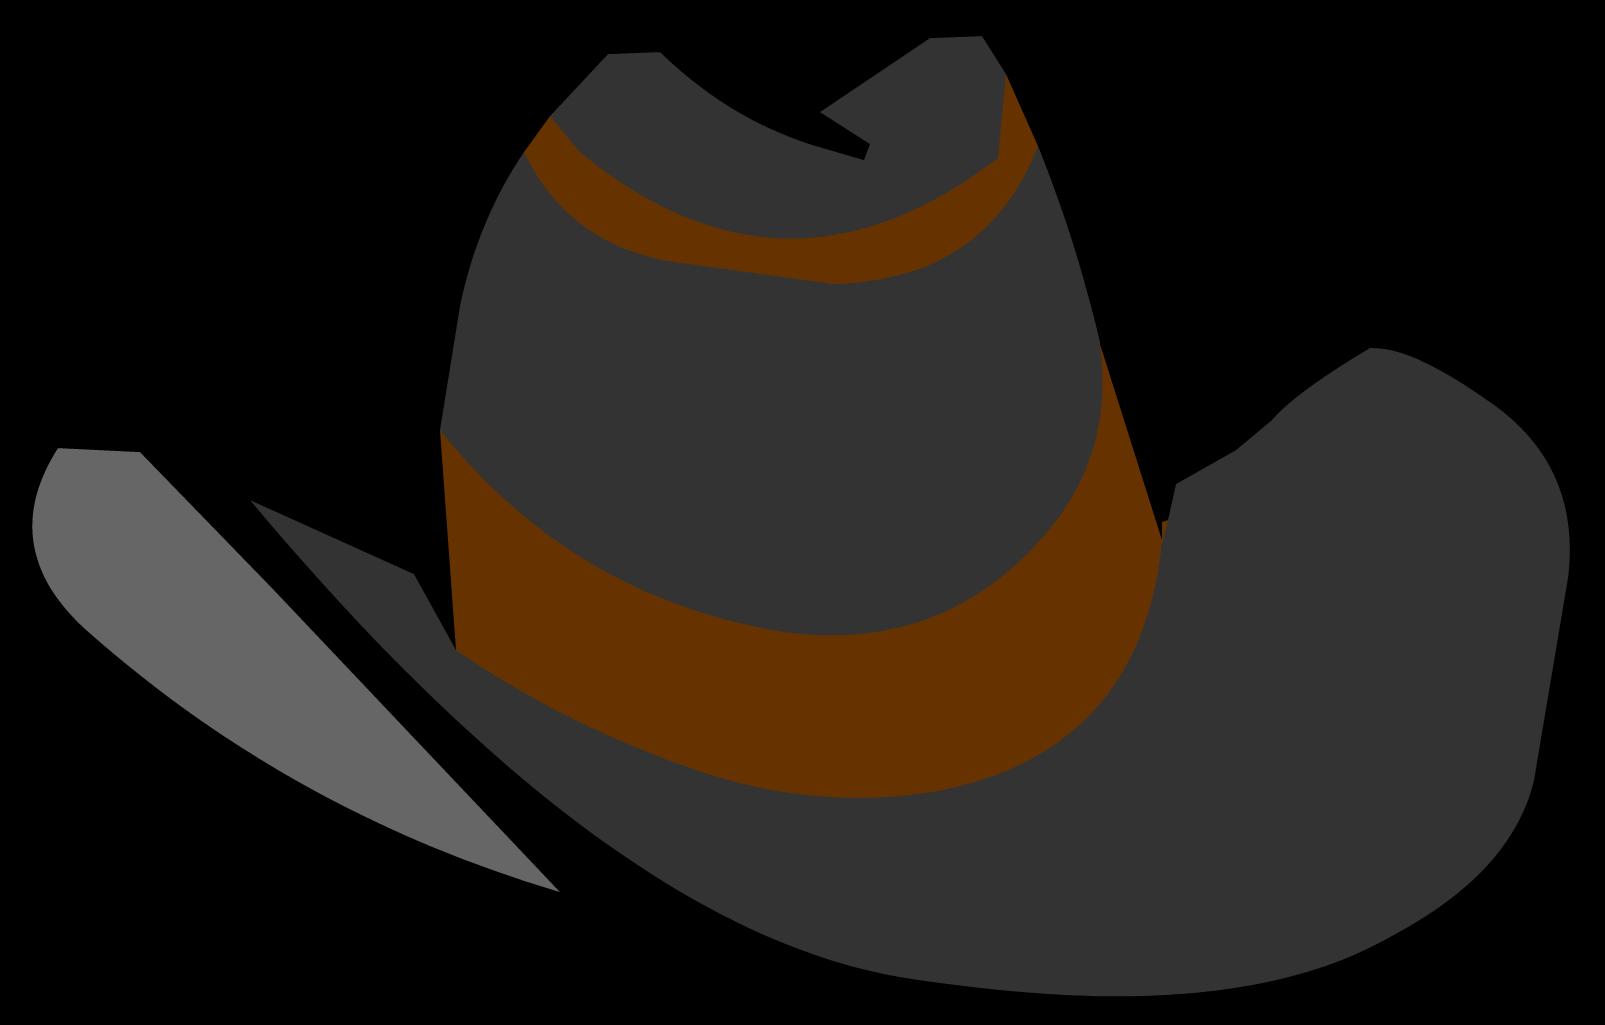 Clothing clipart cowboy, Clothing cowboy Transparent FREE.